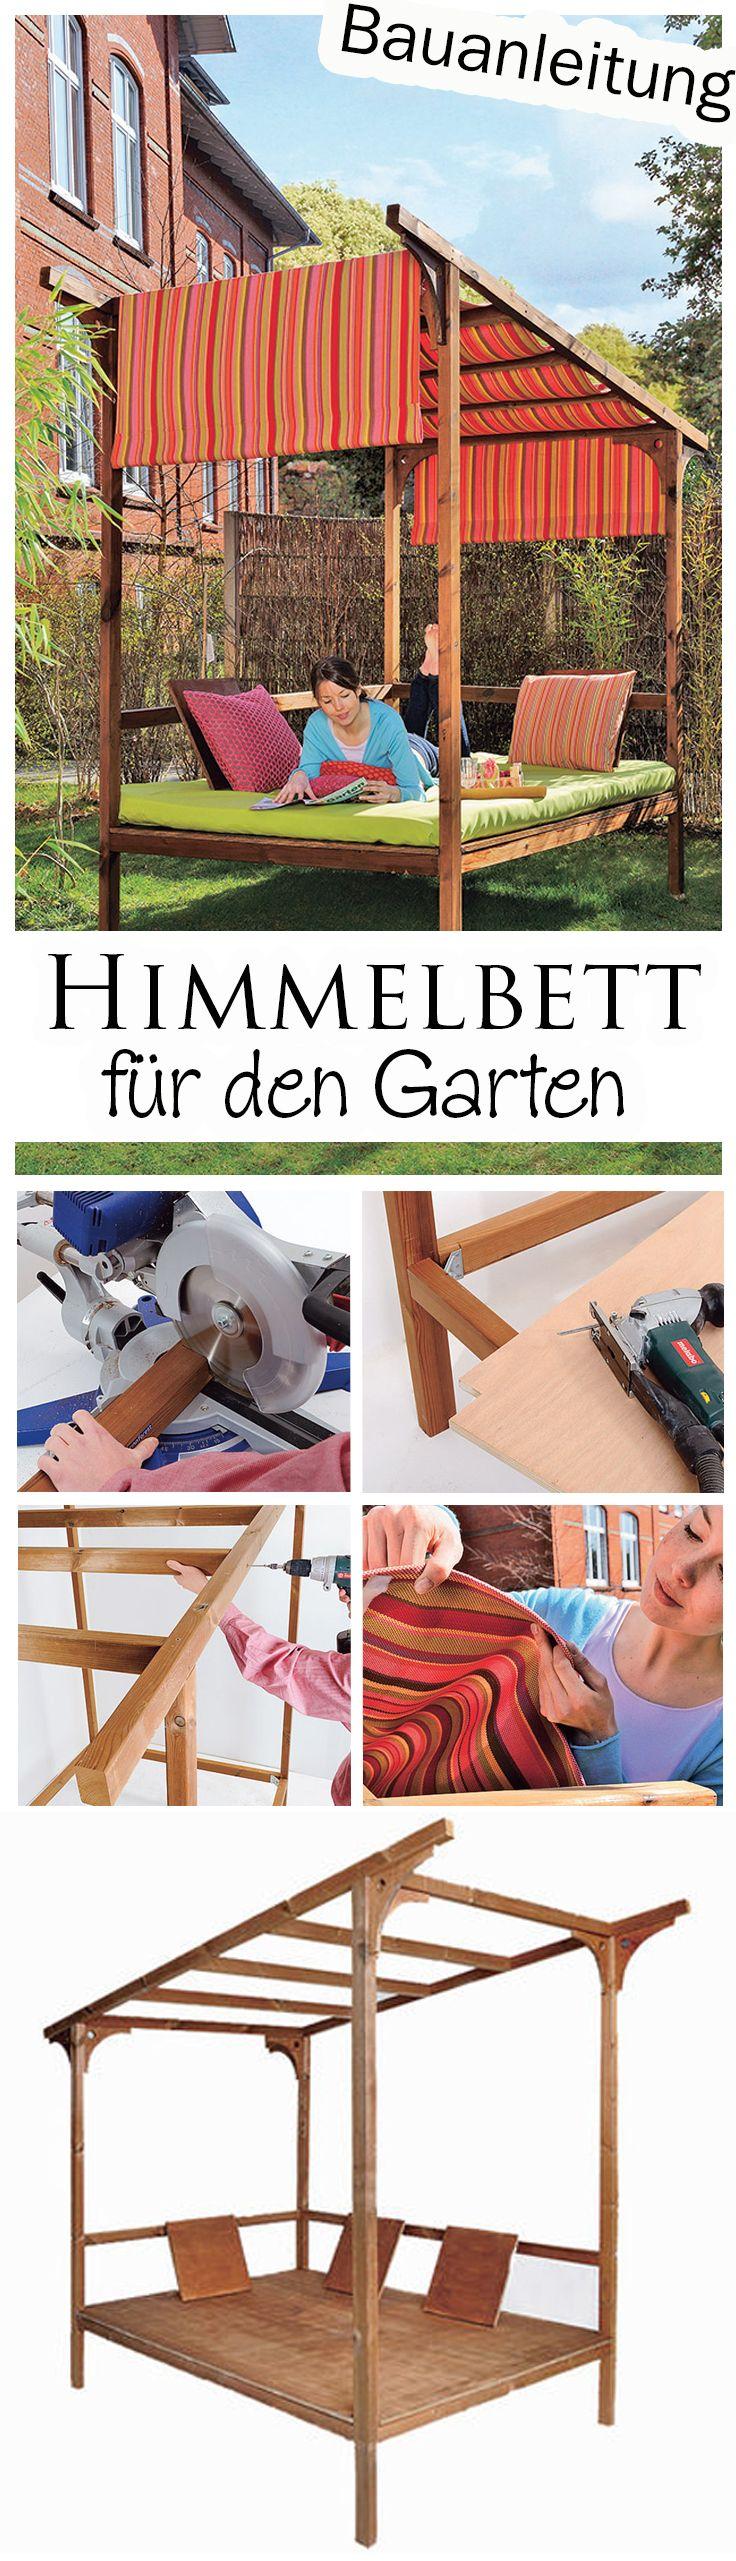 1000+ images about garten on pinterest | deko, gardens and dekoration, Gartengerate ideen